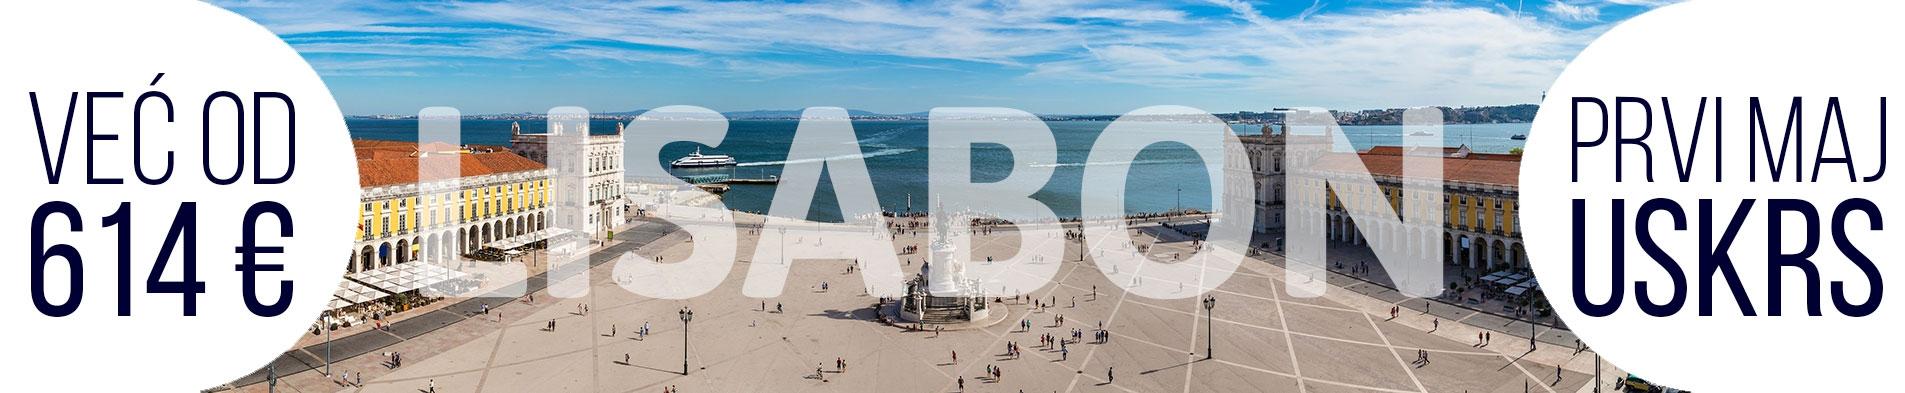 Lisabon avionom prvi maj uskrs 2020